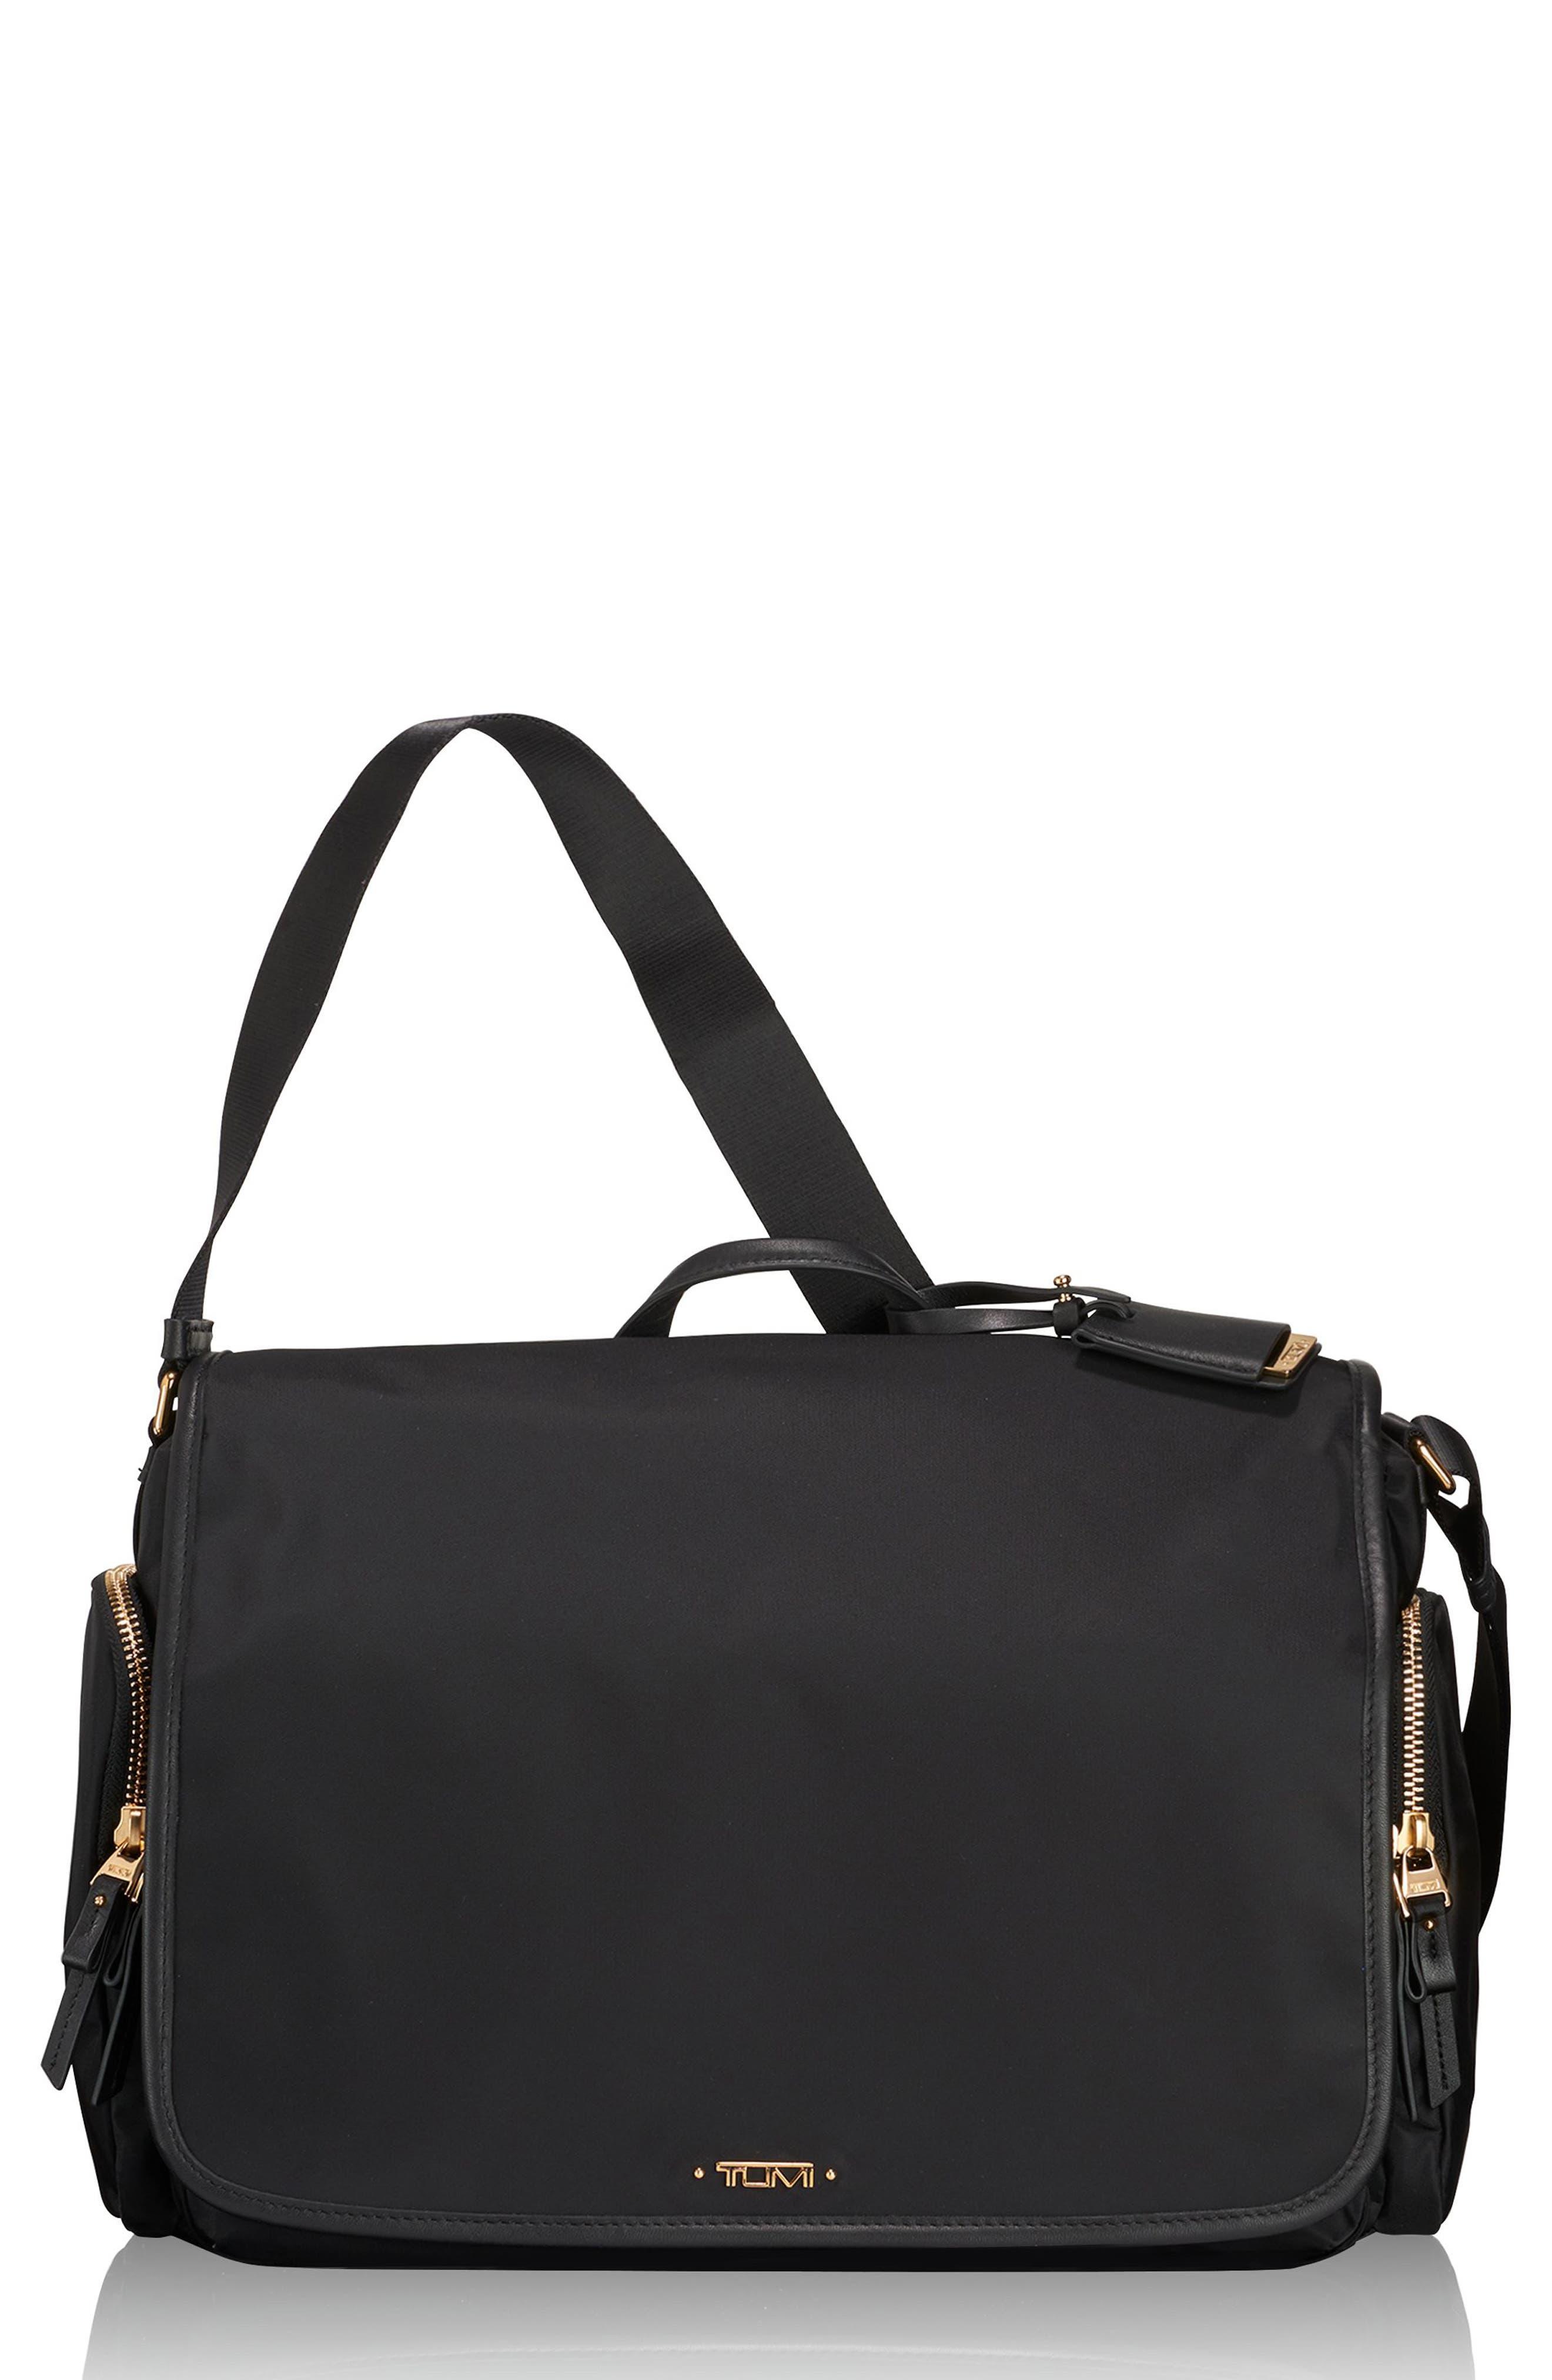 Lola Nylon Crossbody Bag,                             Main thumbnail 1, color,                             001